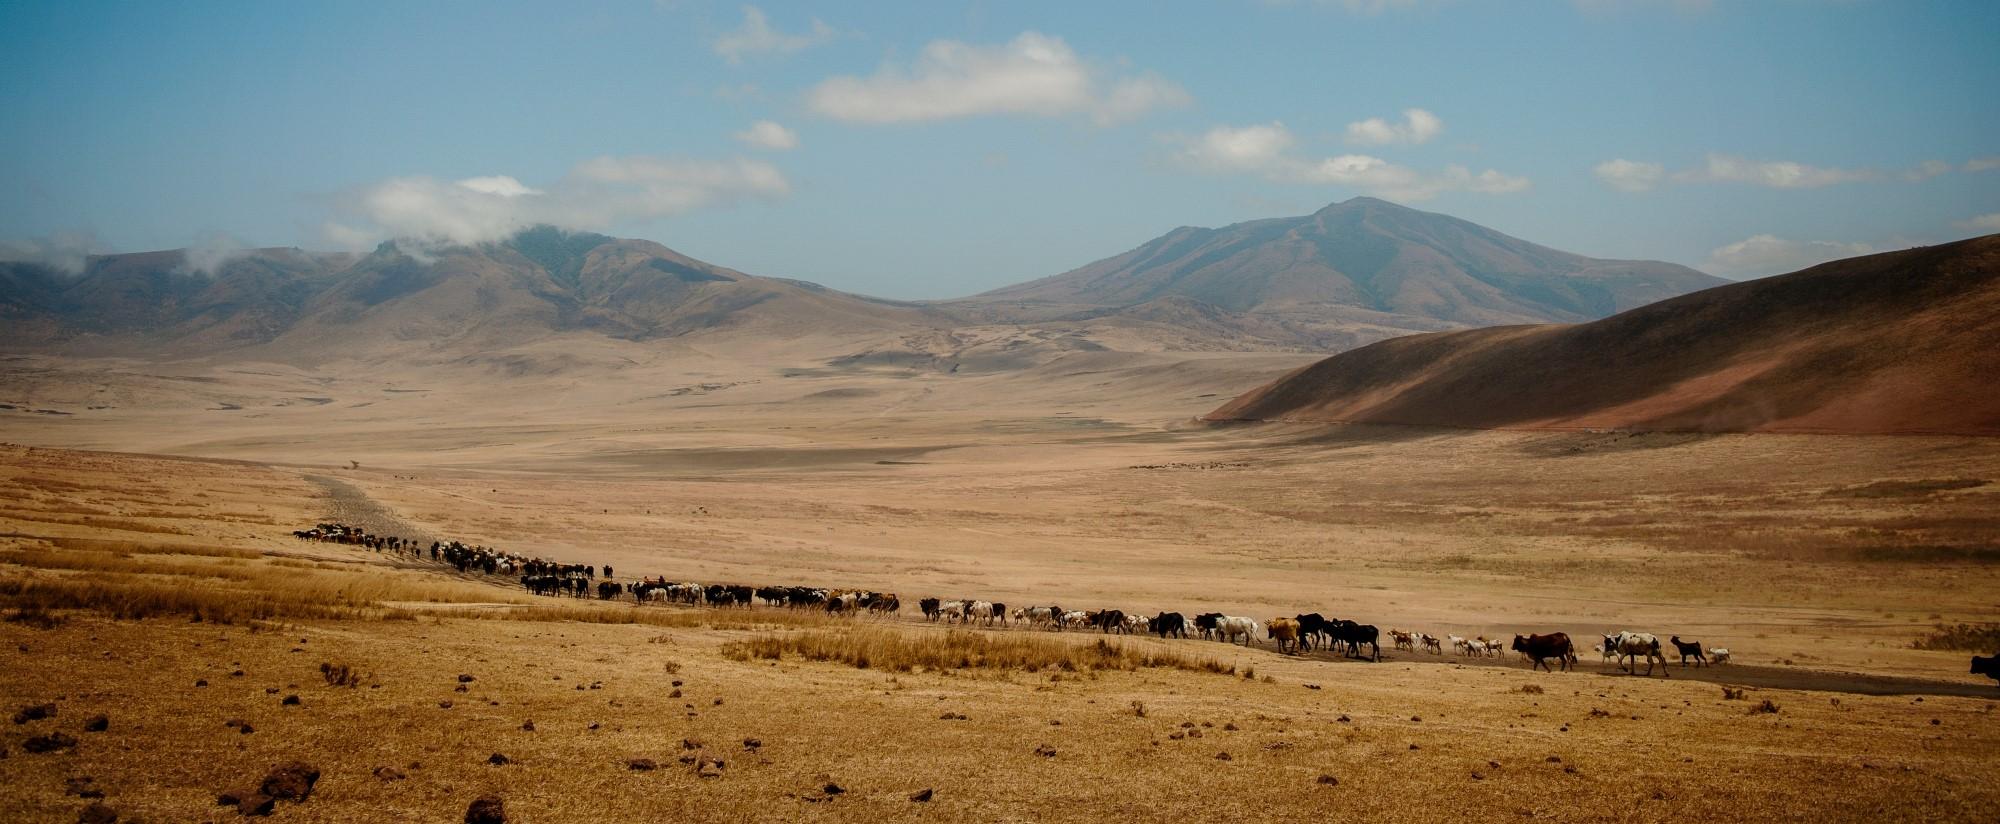 luxury-tailor-made-safari-ngorongoro